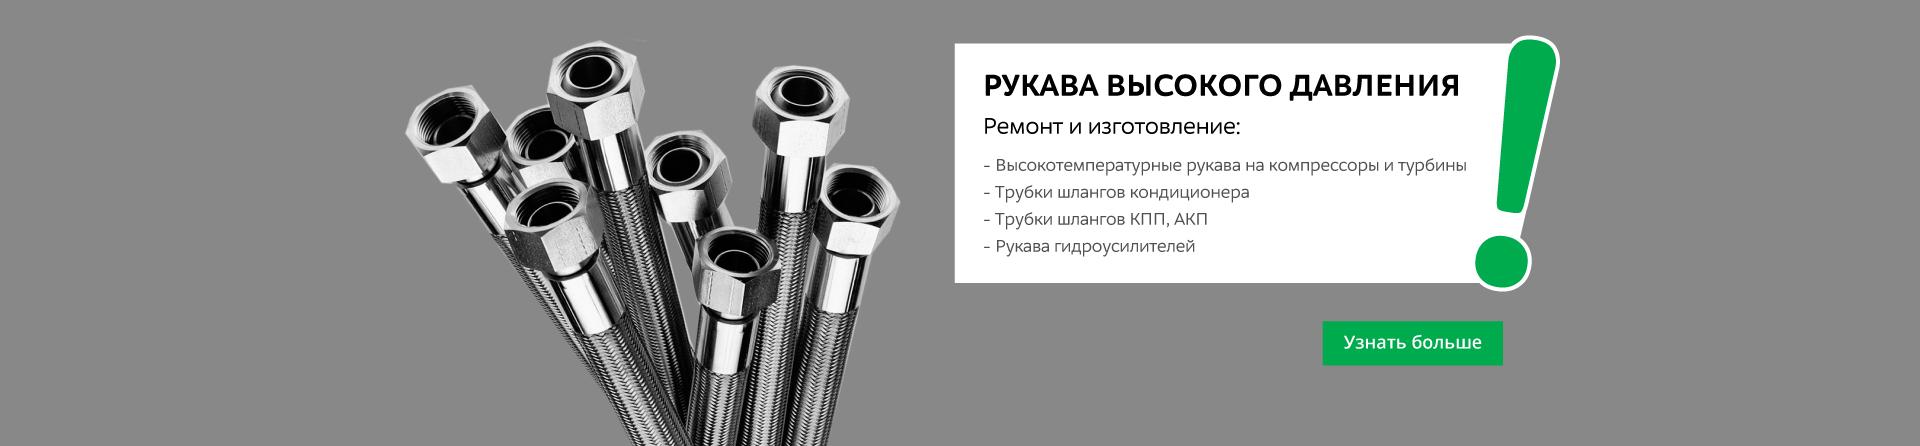 texkom.ru/upload/iblock/1a0/1a09a0690a8e8702620ec0dba9c9cf87.jpg